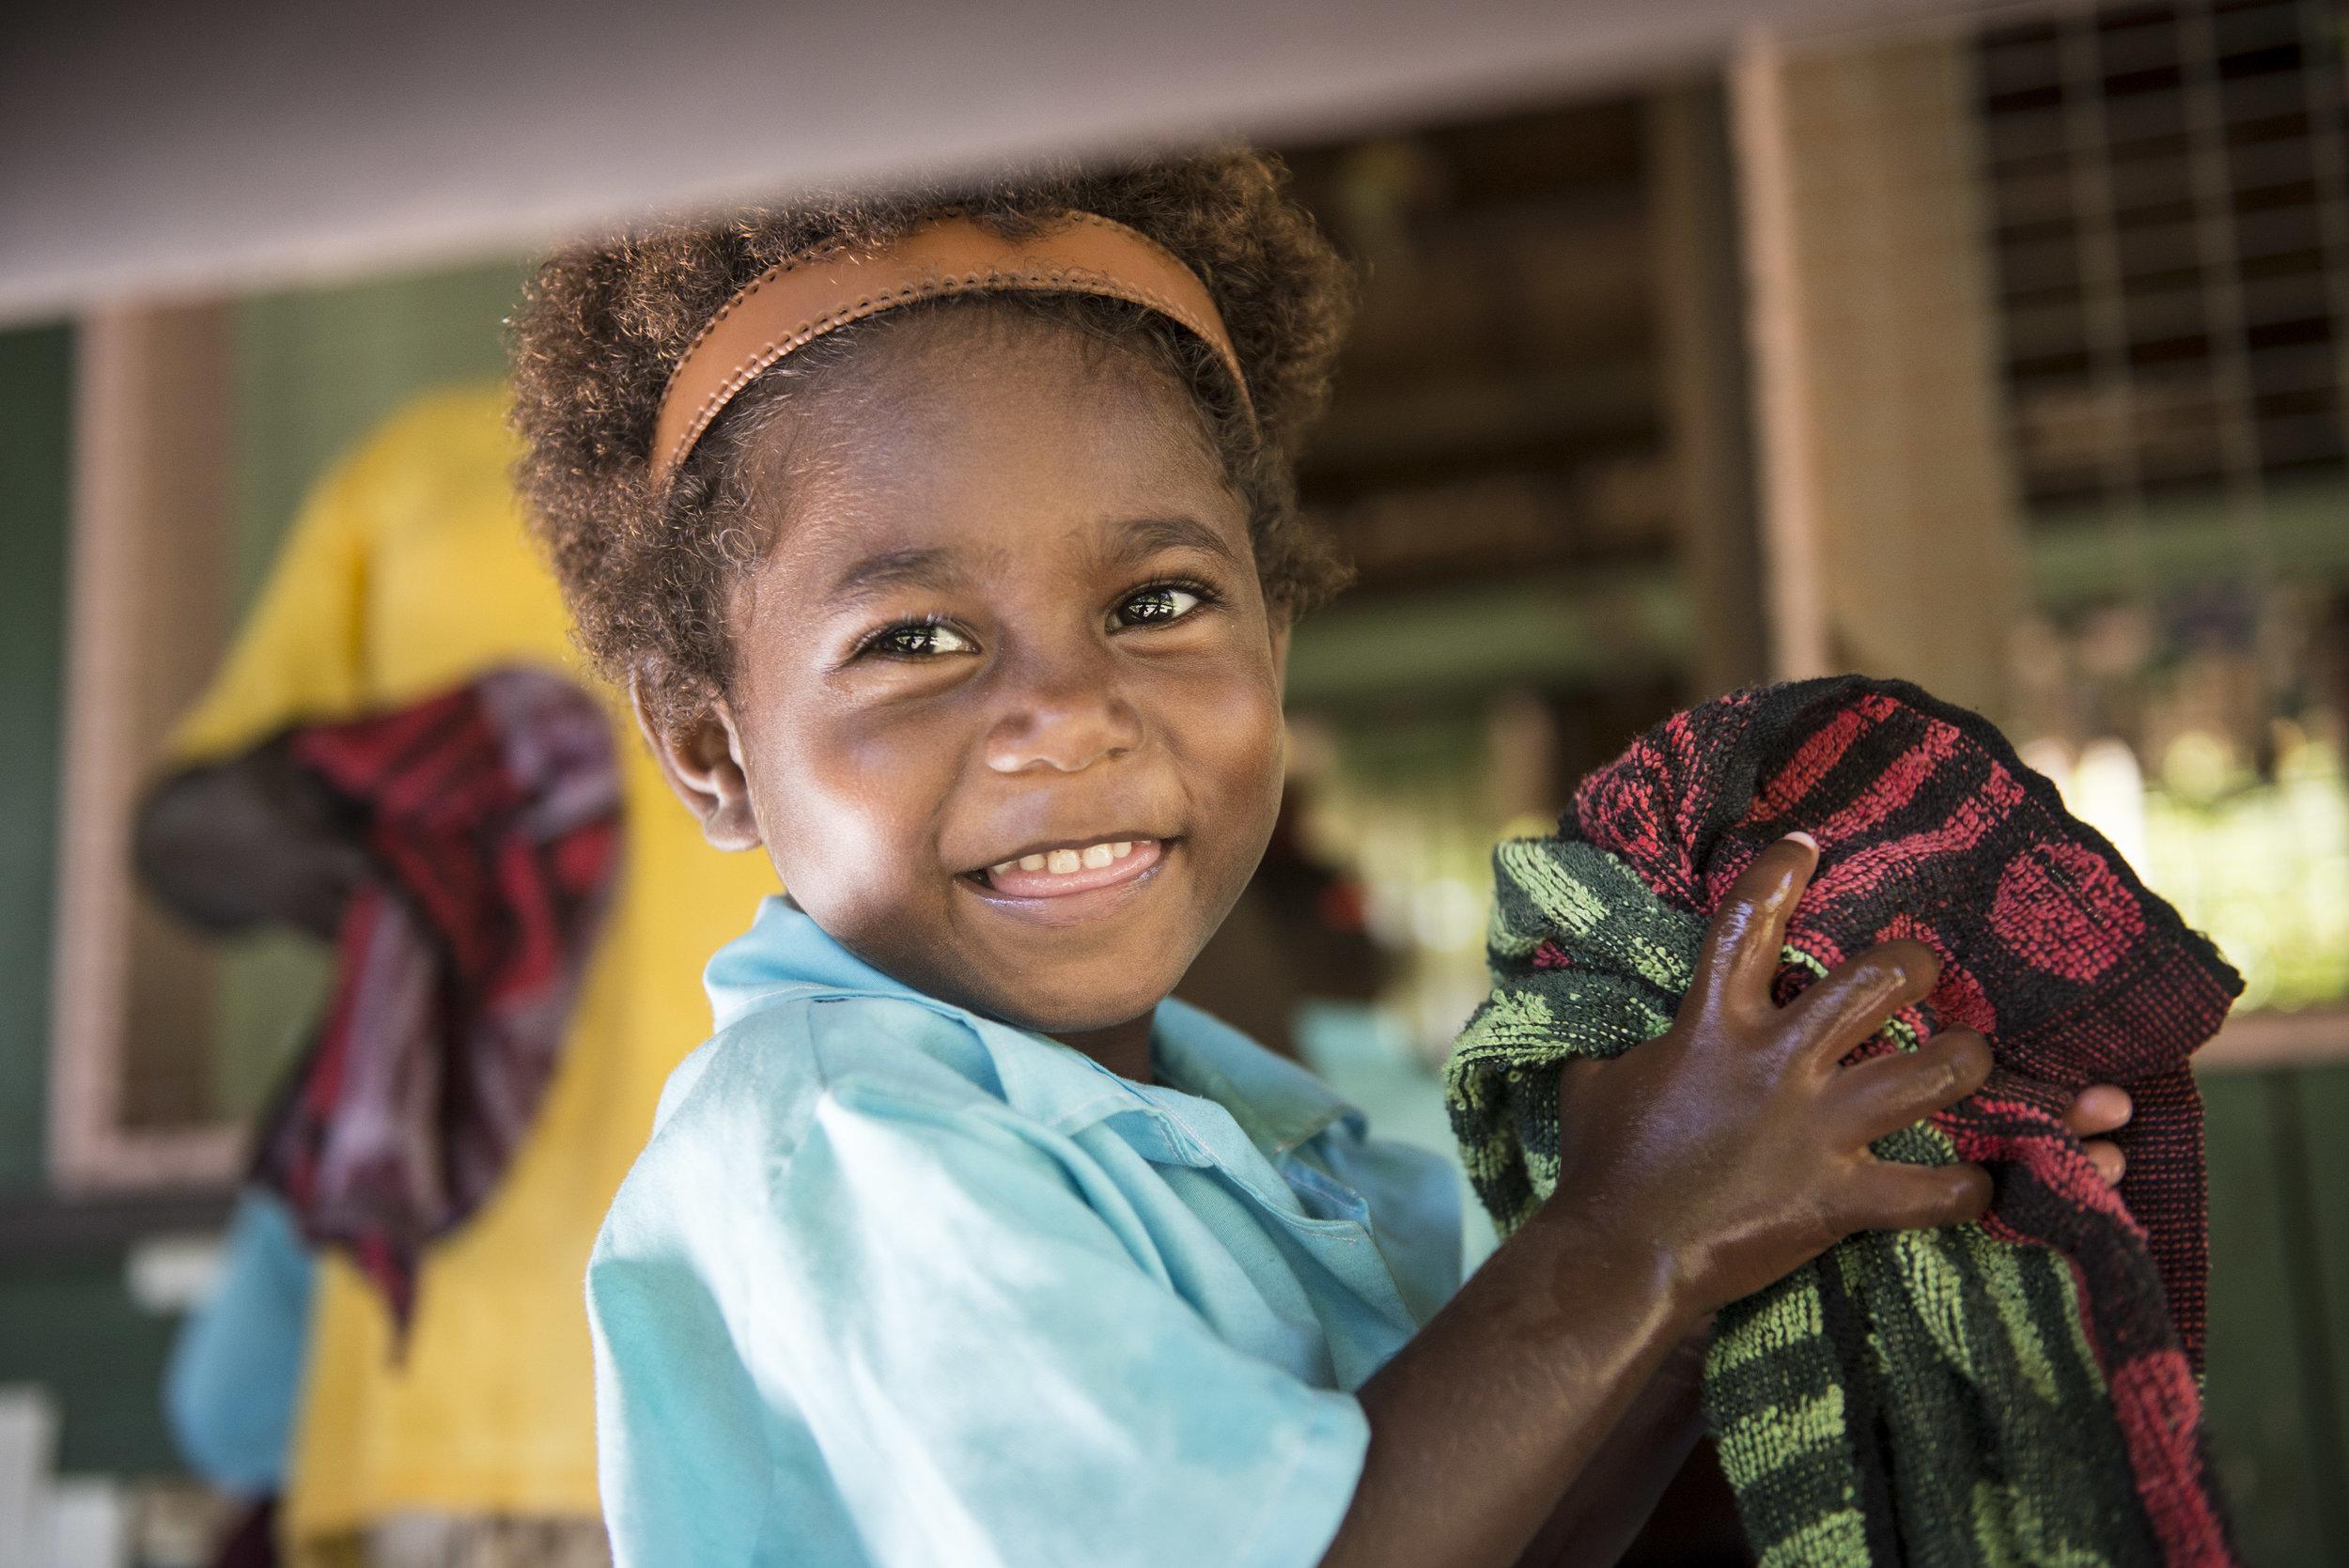 Early Childhood Centre. Choisuel Province. Solomon Islands. 2016.